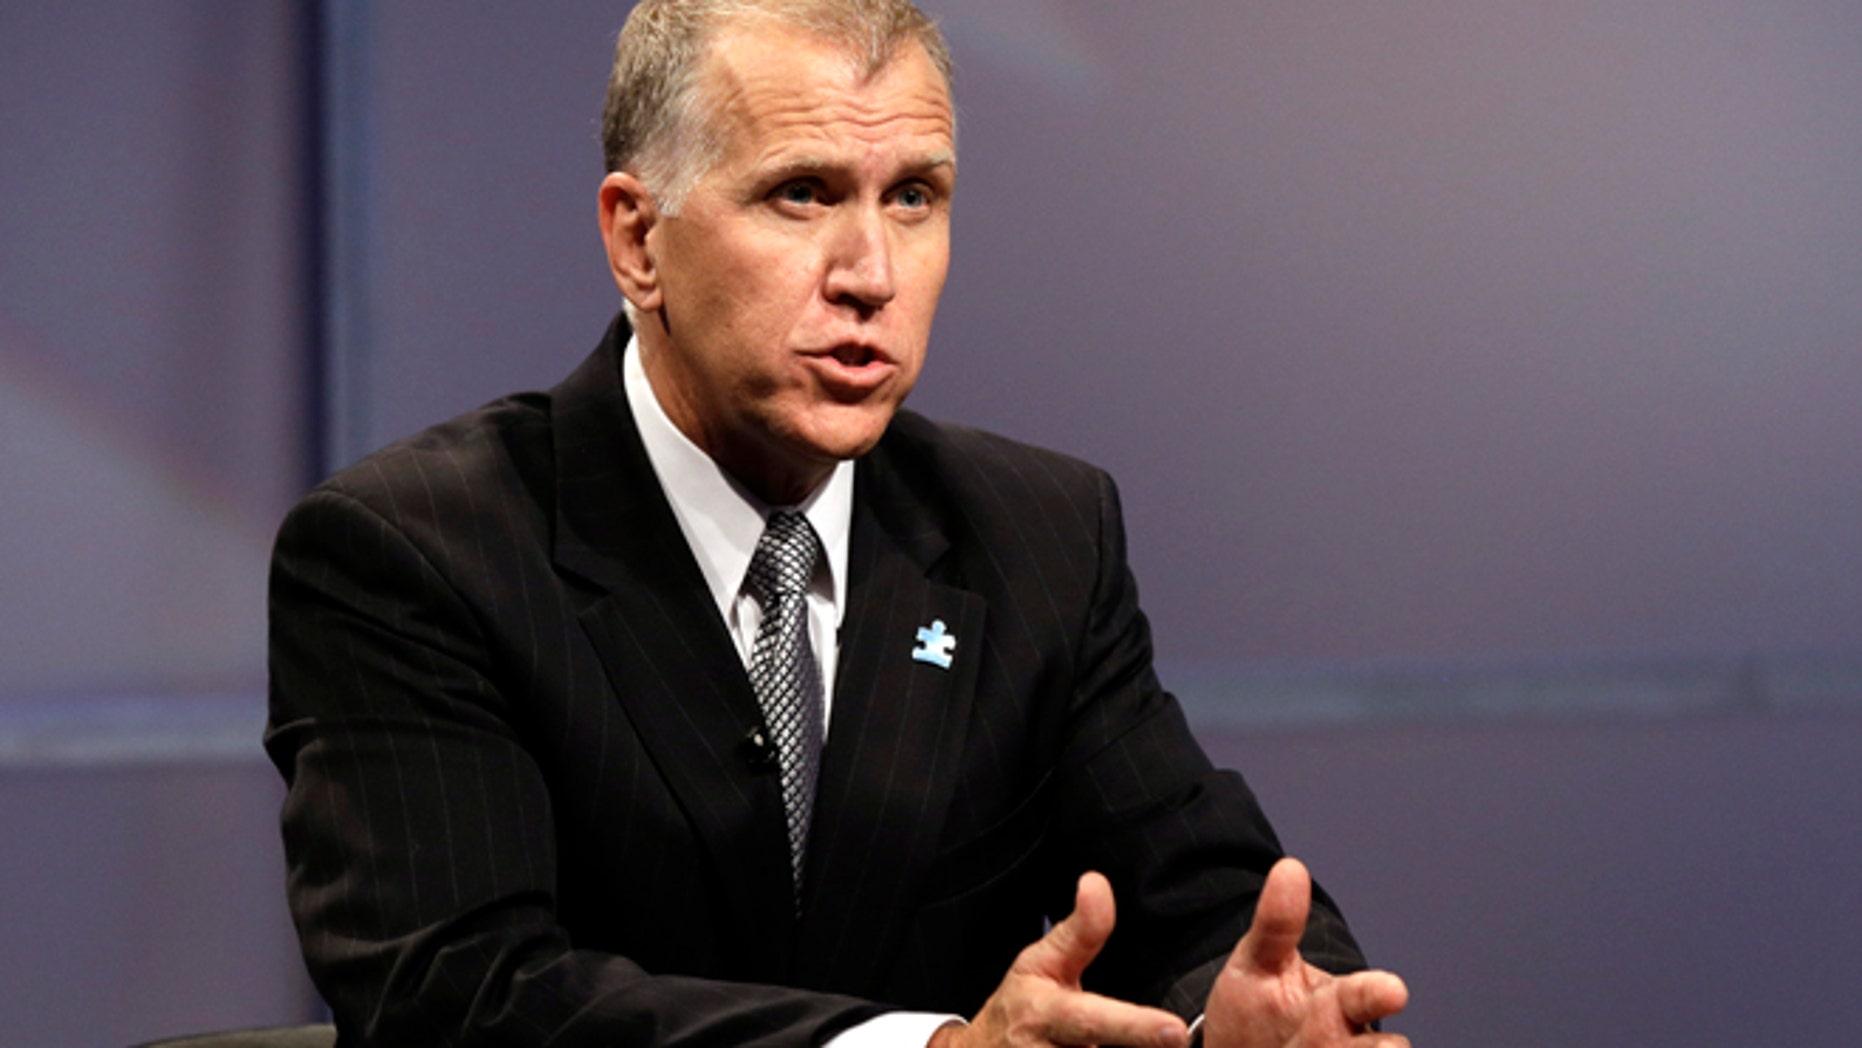 April 23, 2014: Republican senatorial candidate Thom Tillis responds during a televised debate at WRAL television studios in Raleigh, N.C.